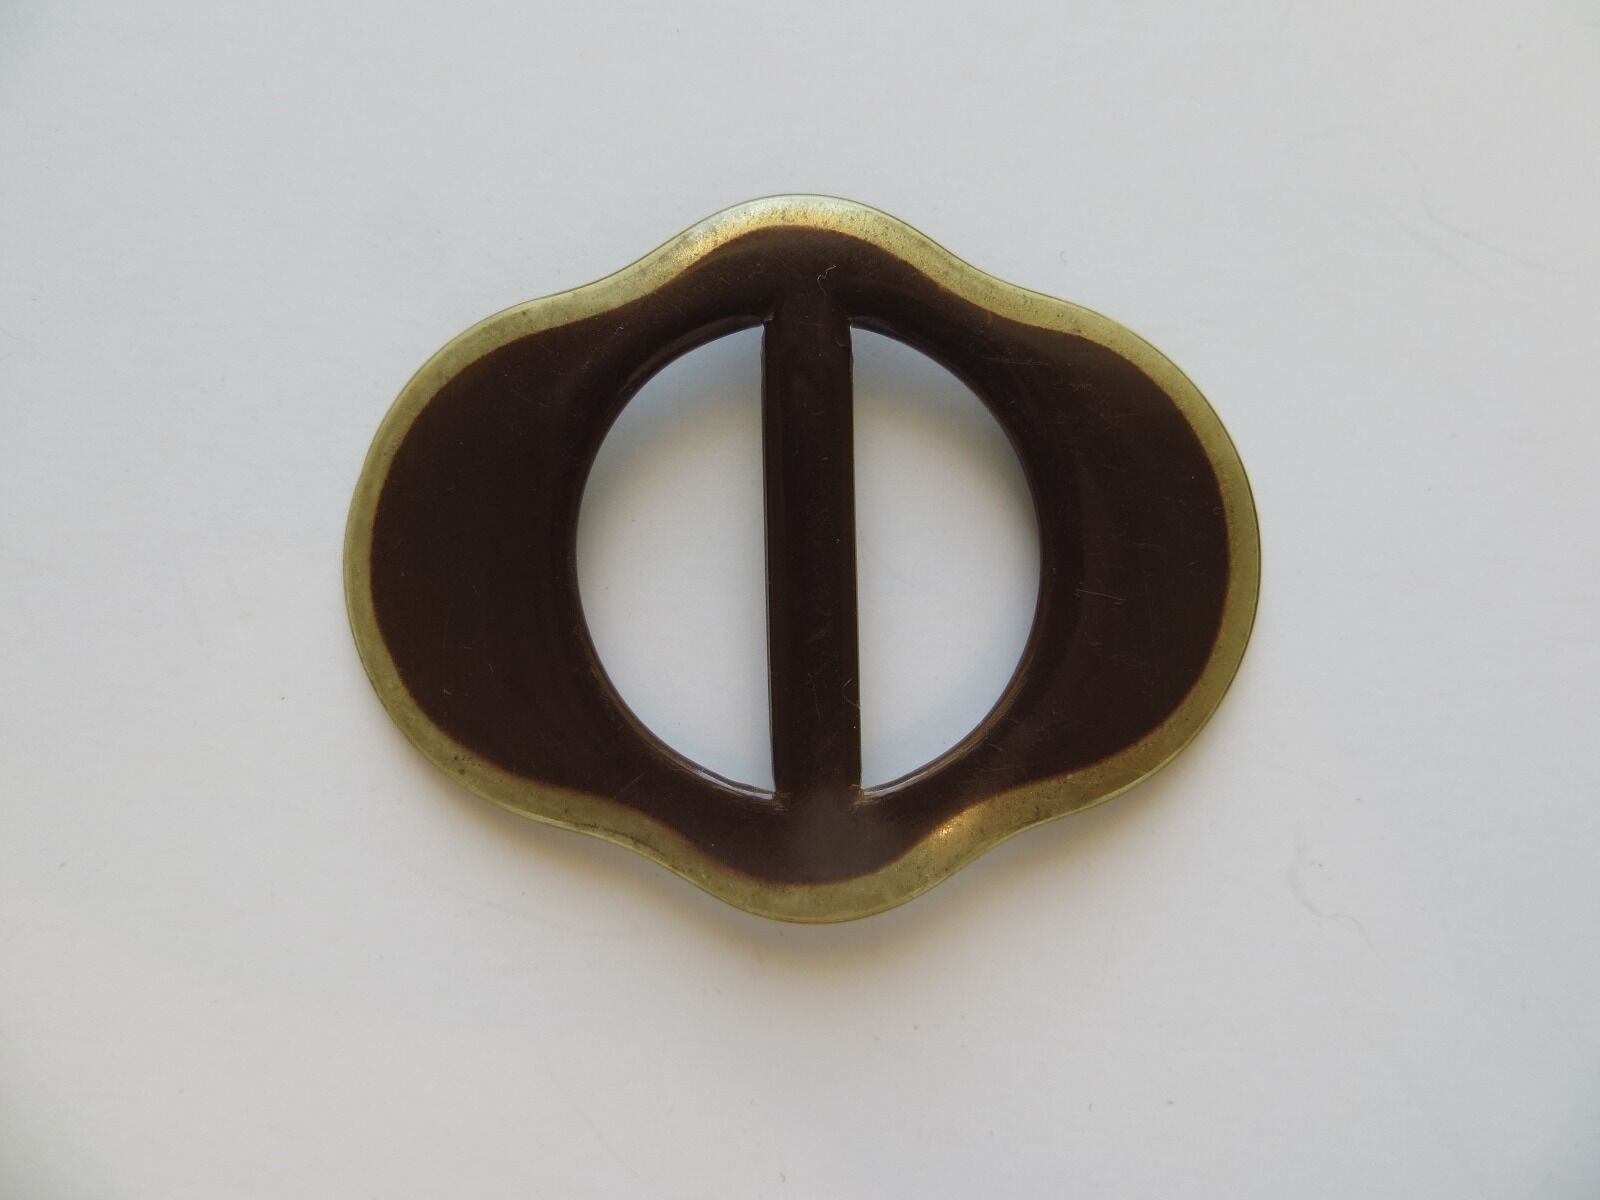 1920s Art Deco Celluloid Handpainted Brown Gold Belt Buckle-58mm x 44mm